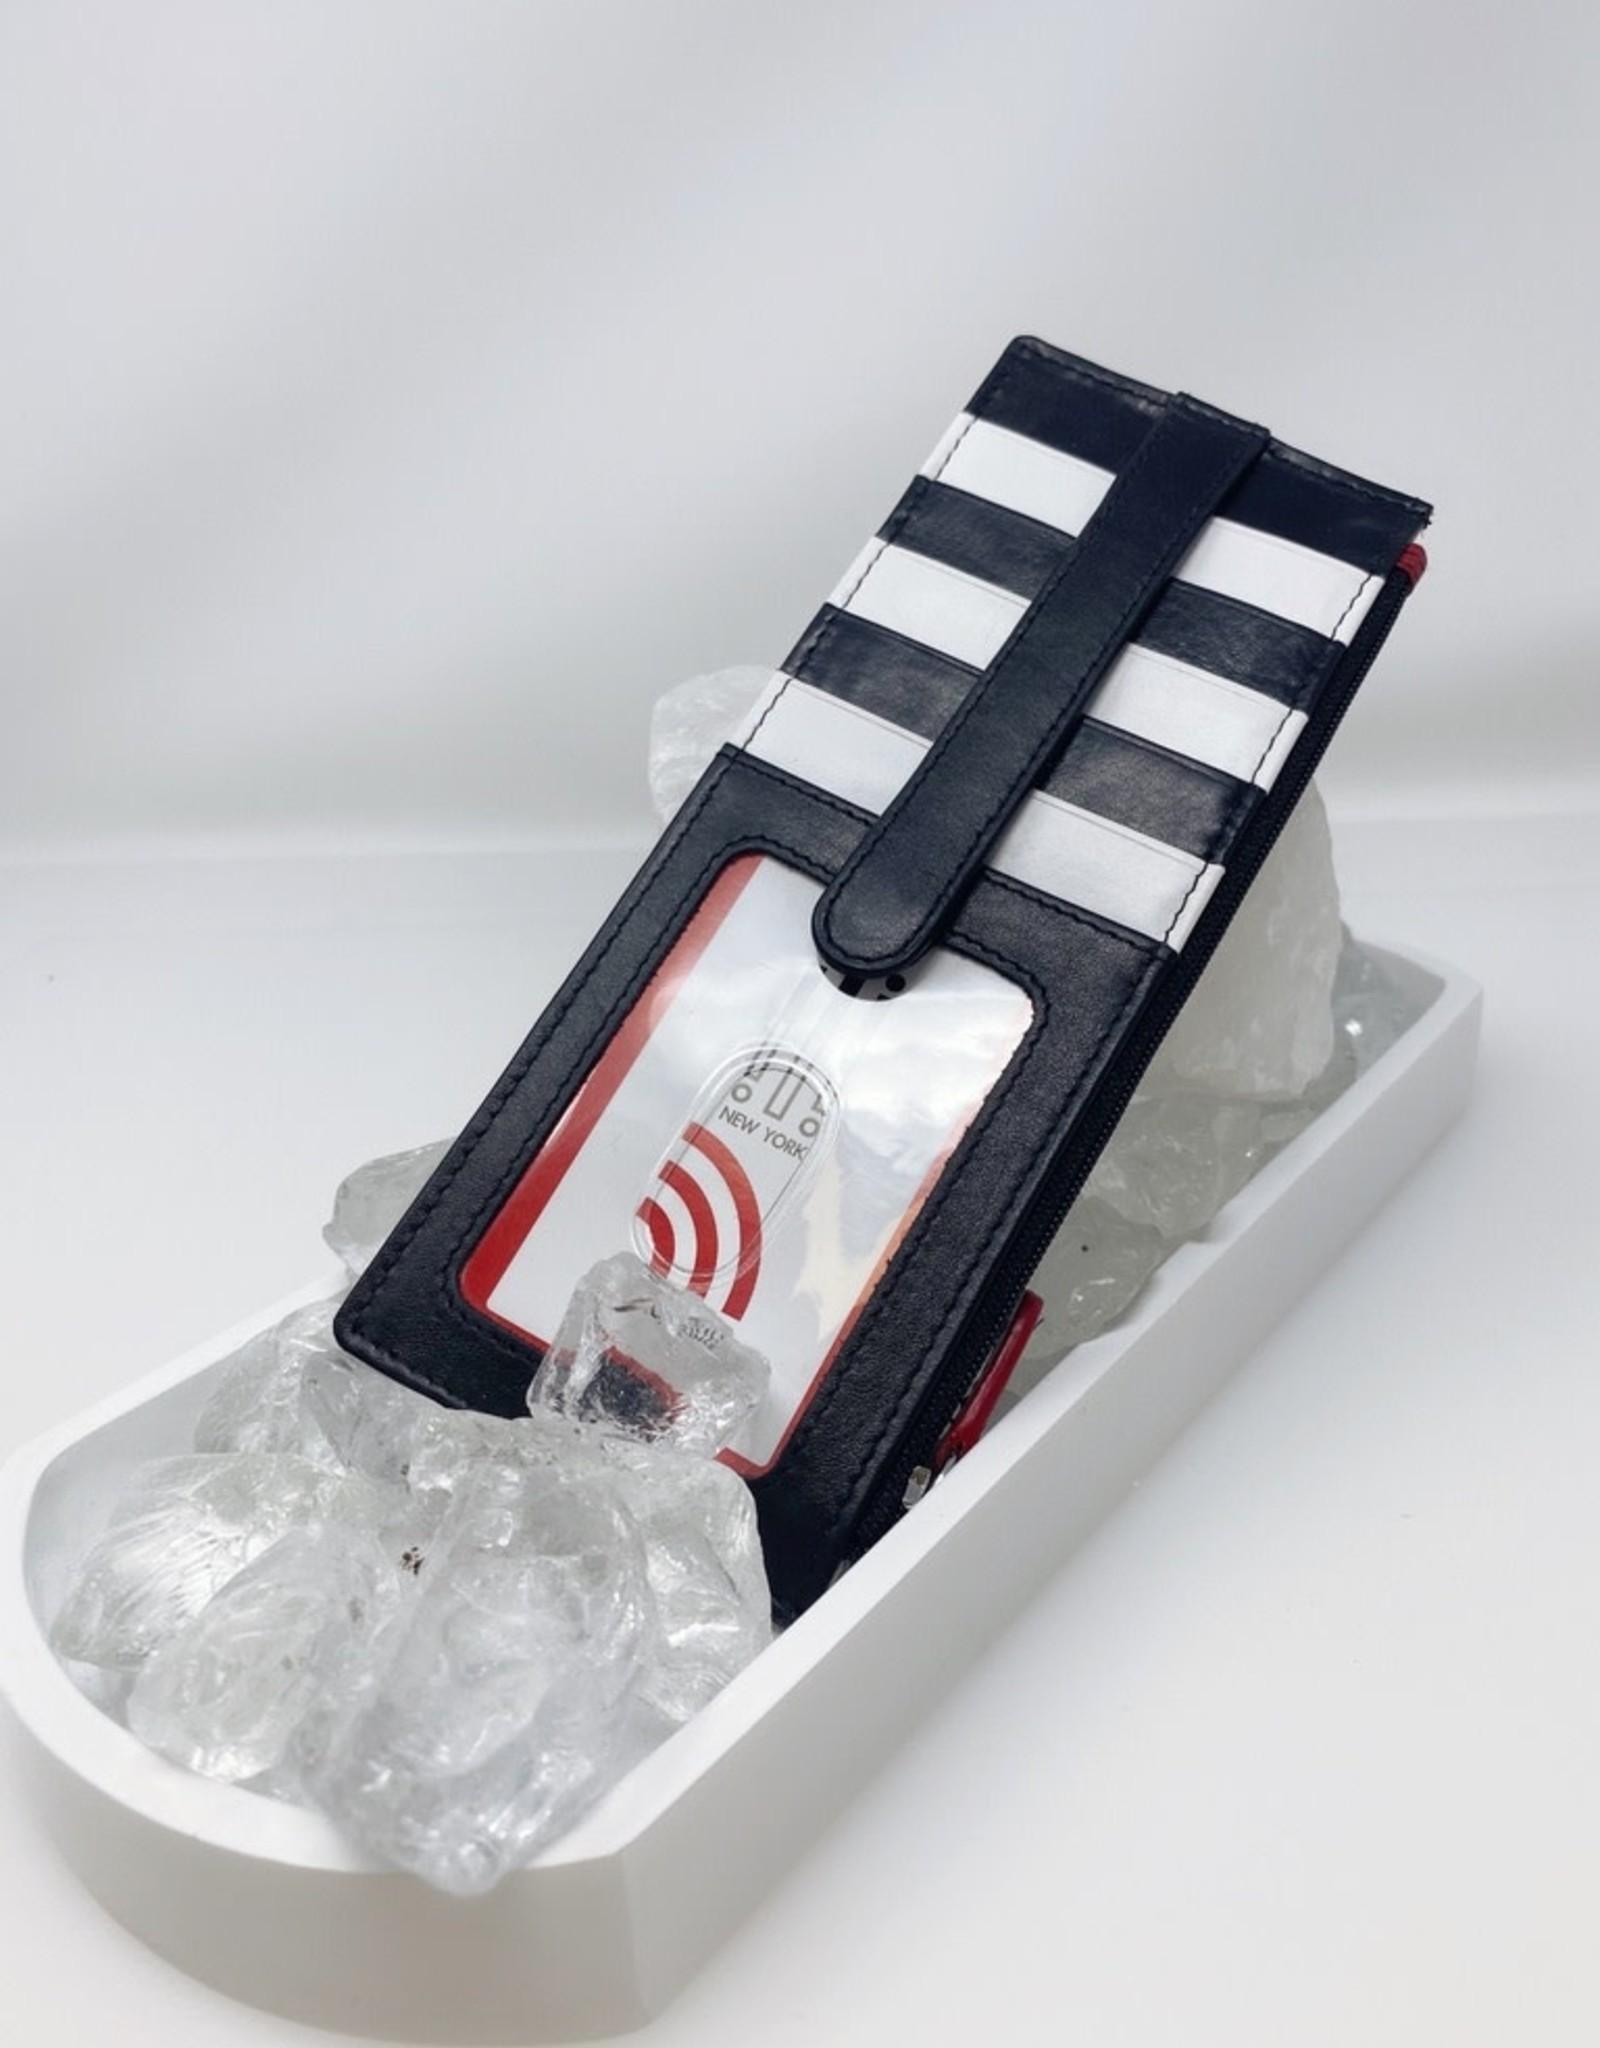 Card Holder with Zip pocket - R/B/W